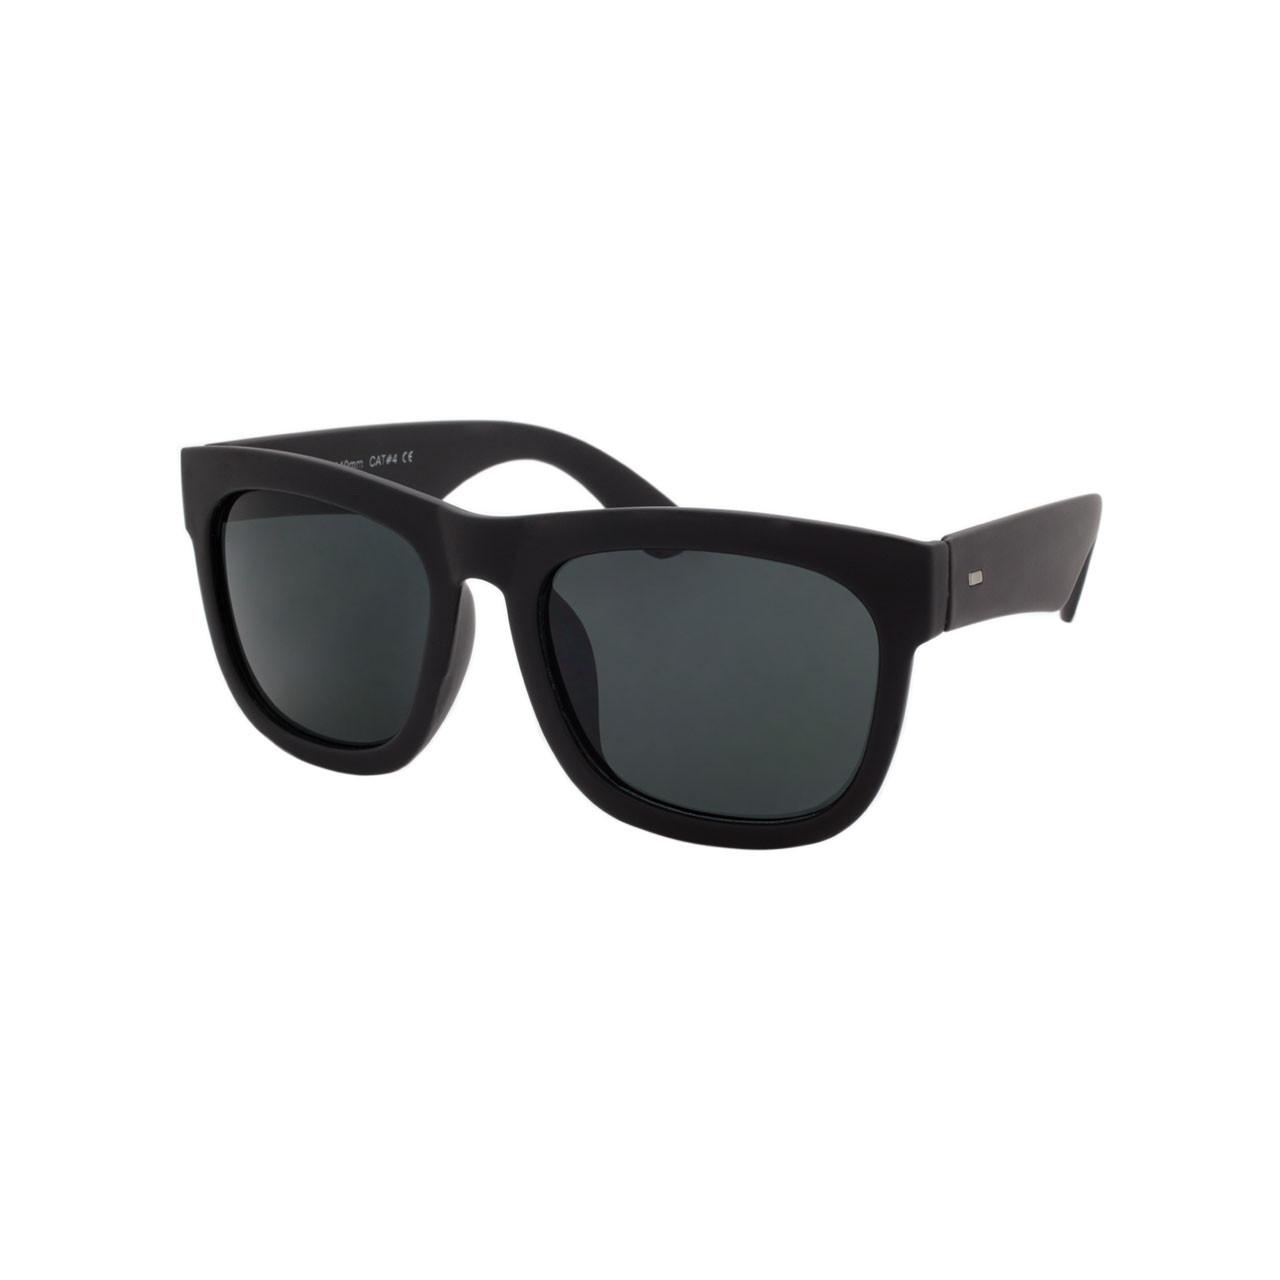 6c73ef38b7 Wholesale Assorted Color Black Plastic Soft Feel UV400 Classic ...